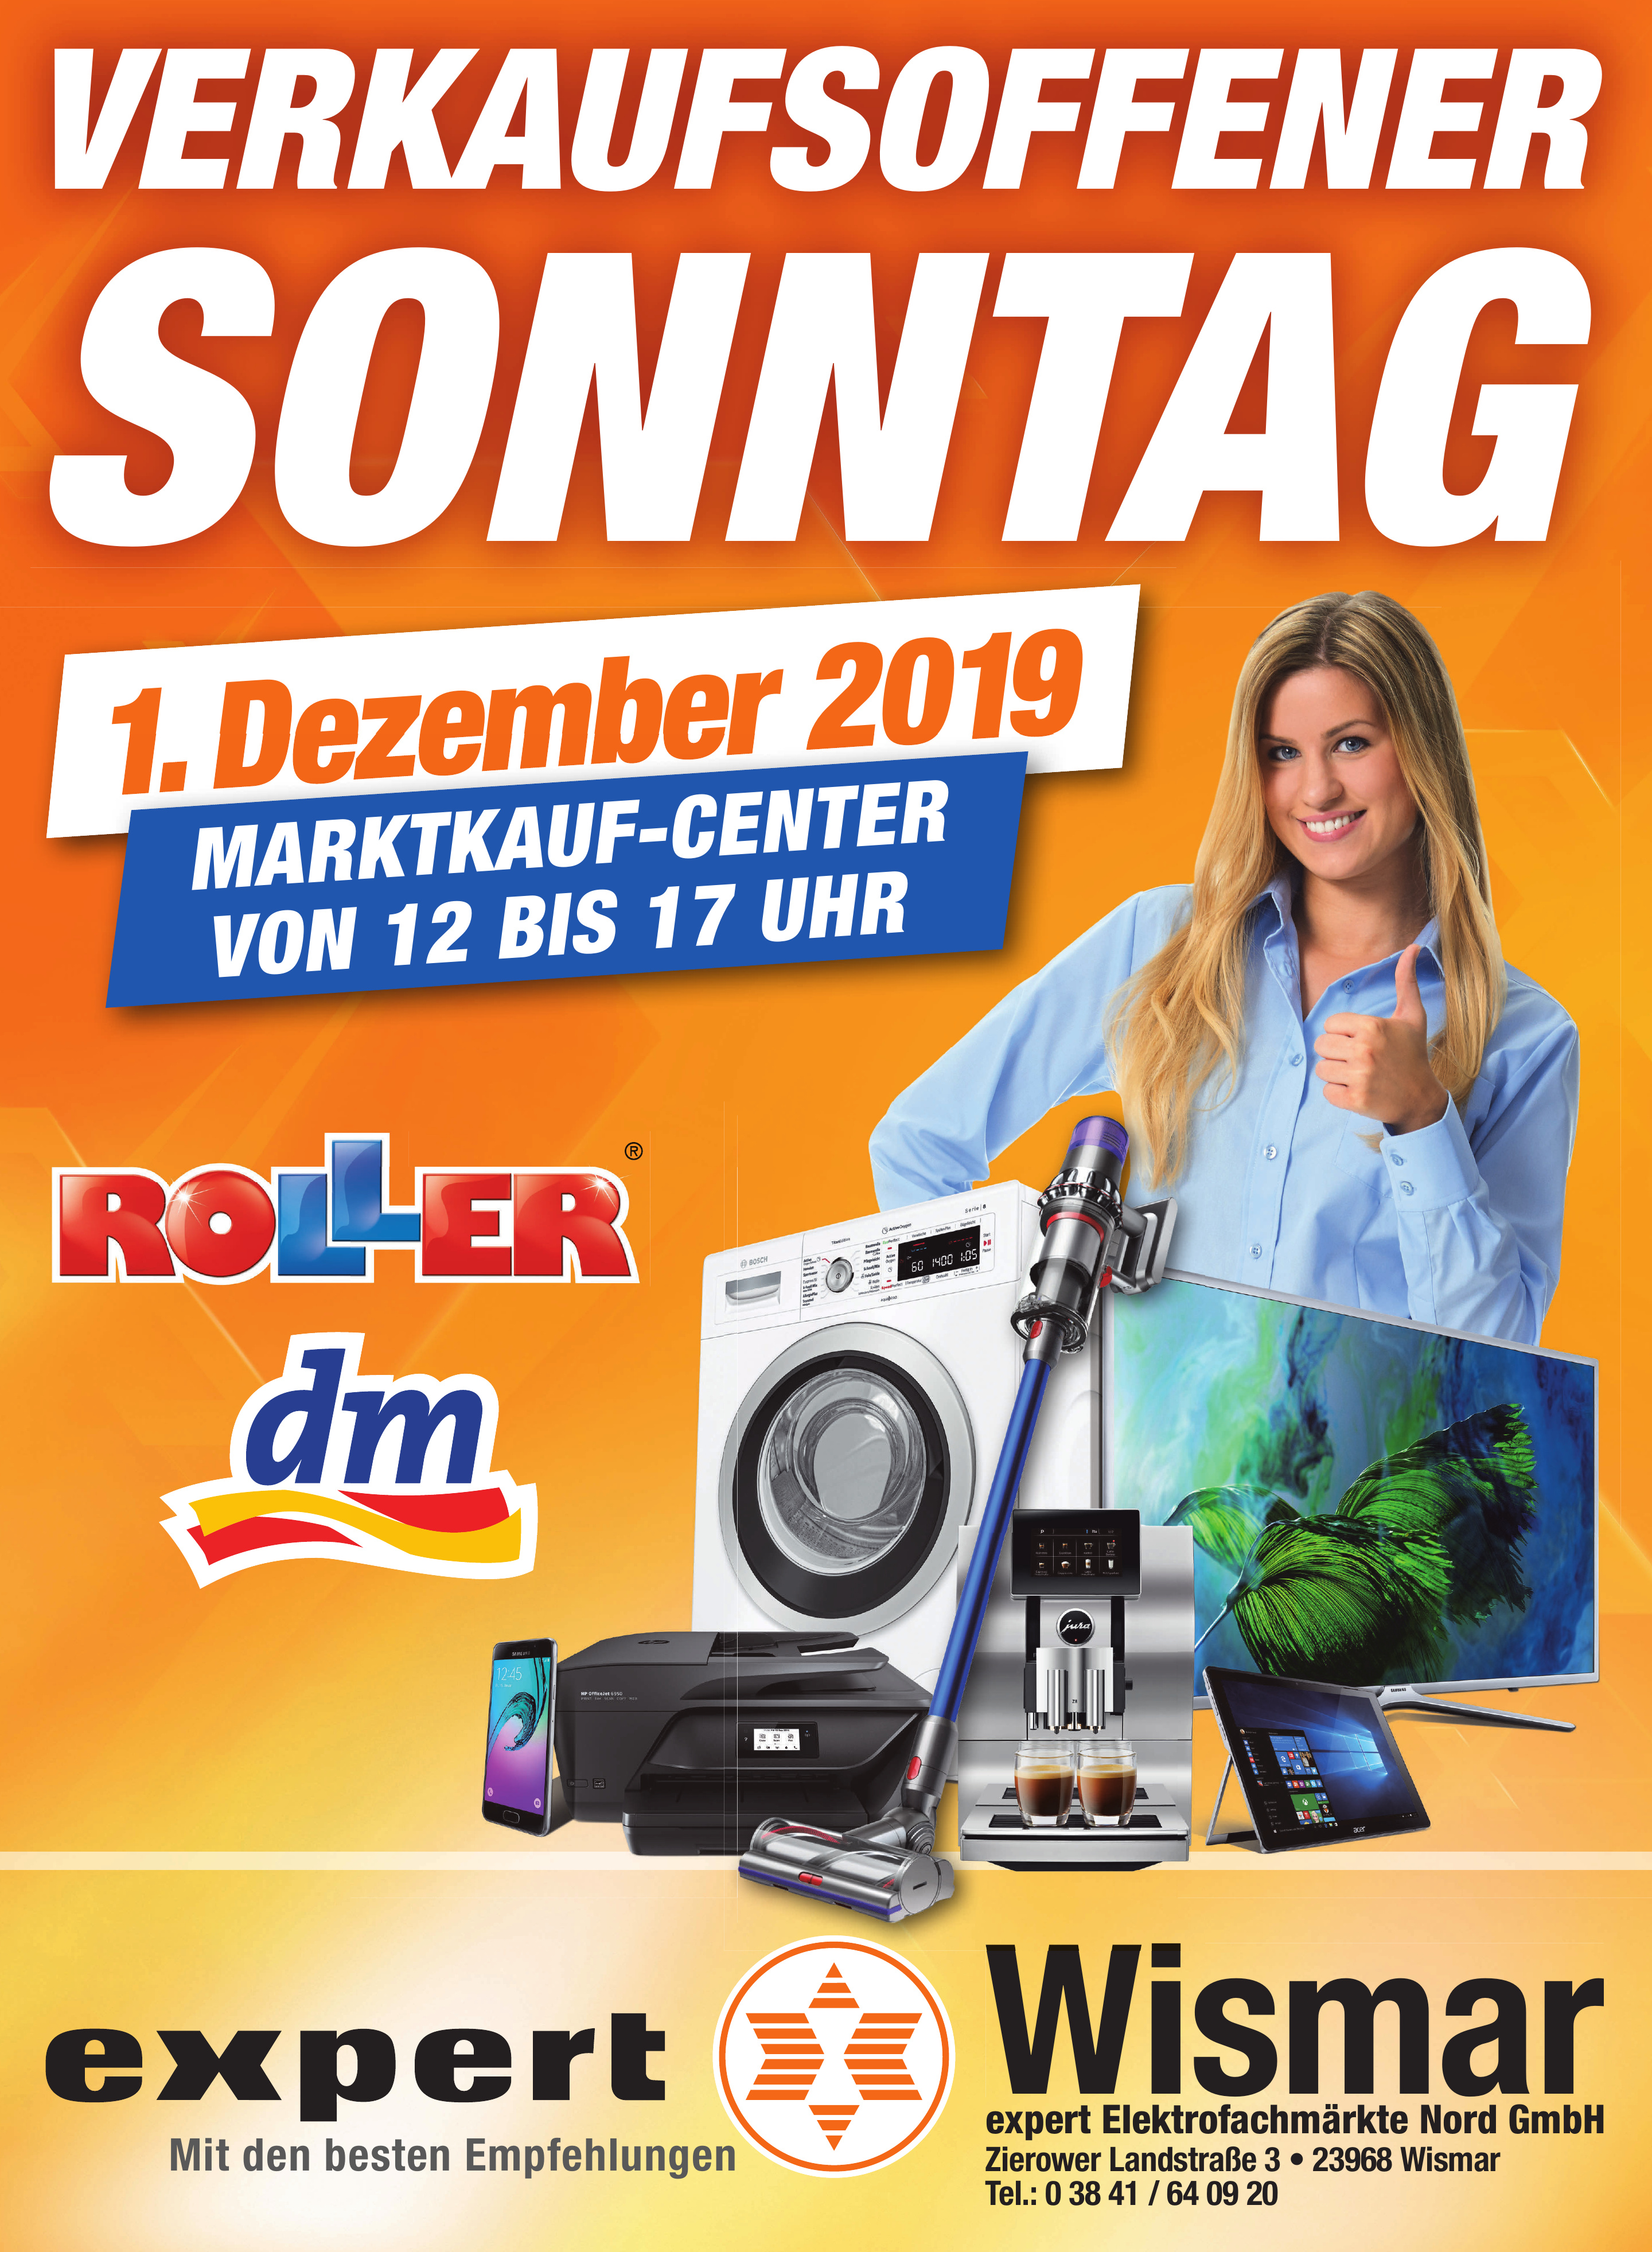 expert Elektrofachmärkte Nord GmbH